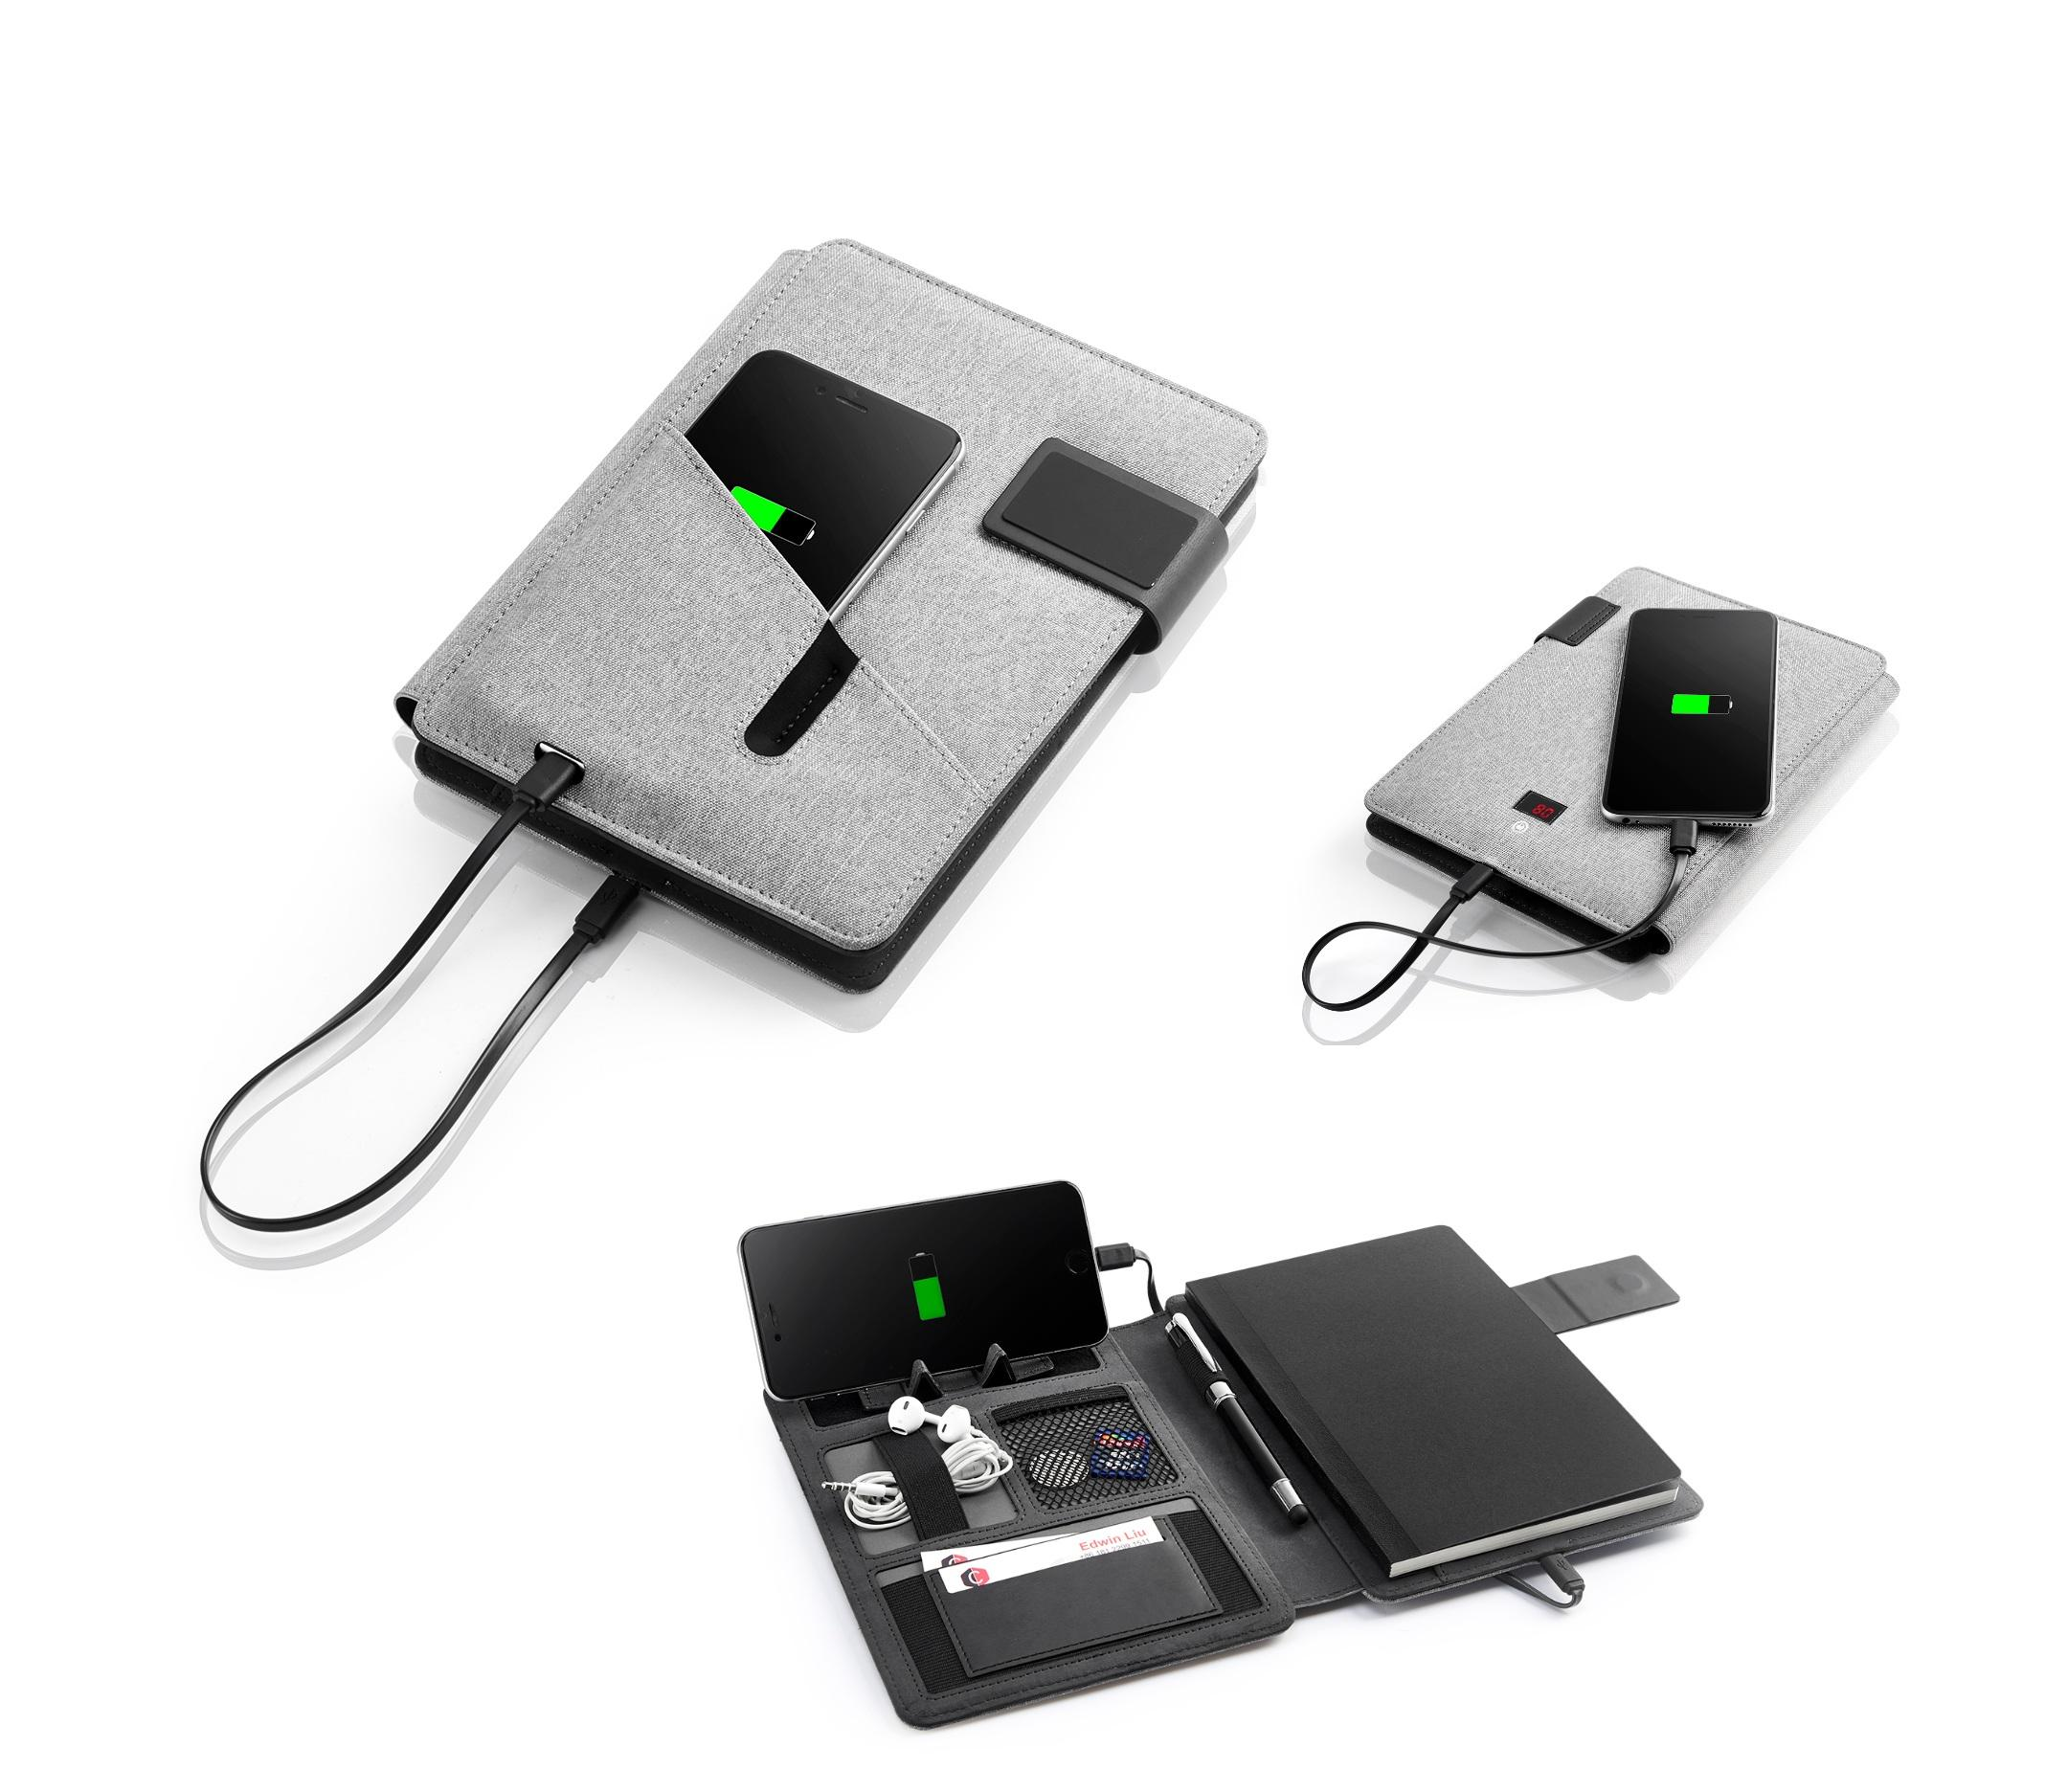 Note book avec power bank intégrée